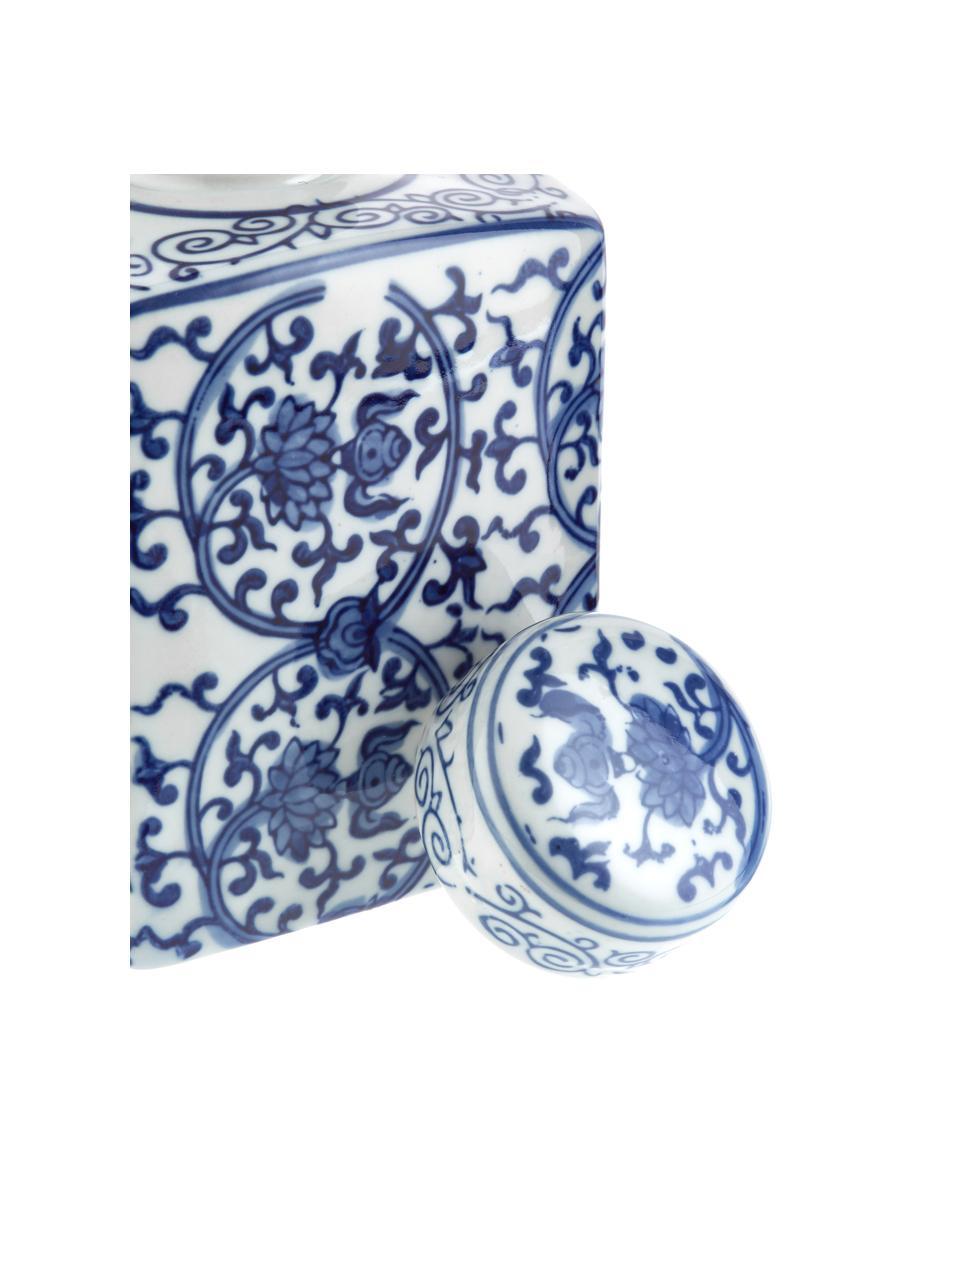 Vaso in porcellana con coperchio Ella, Porcellana, Blu, bianco, Larg. 11 x Alt. 17 cm